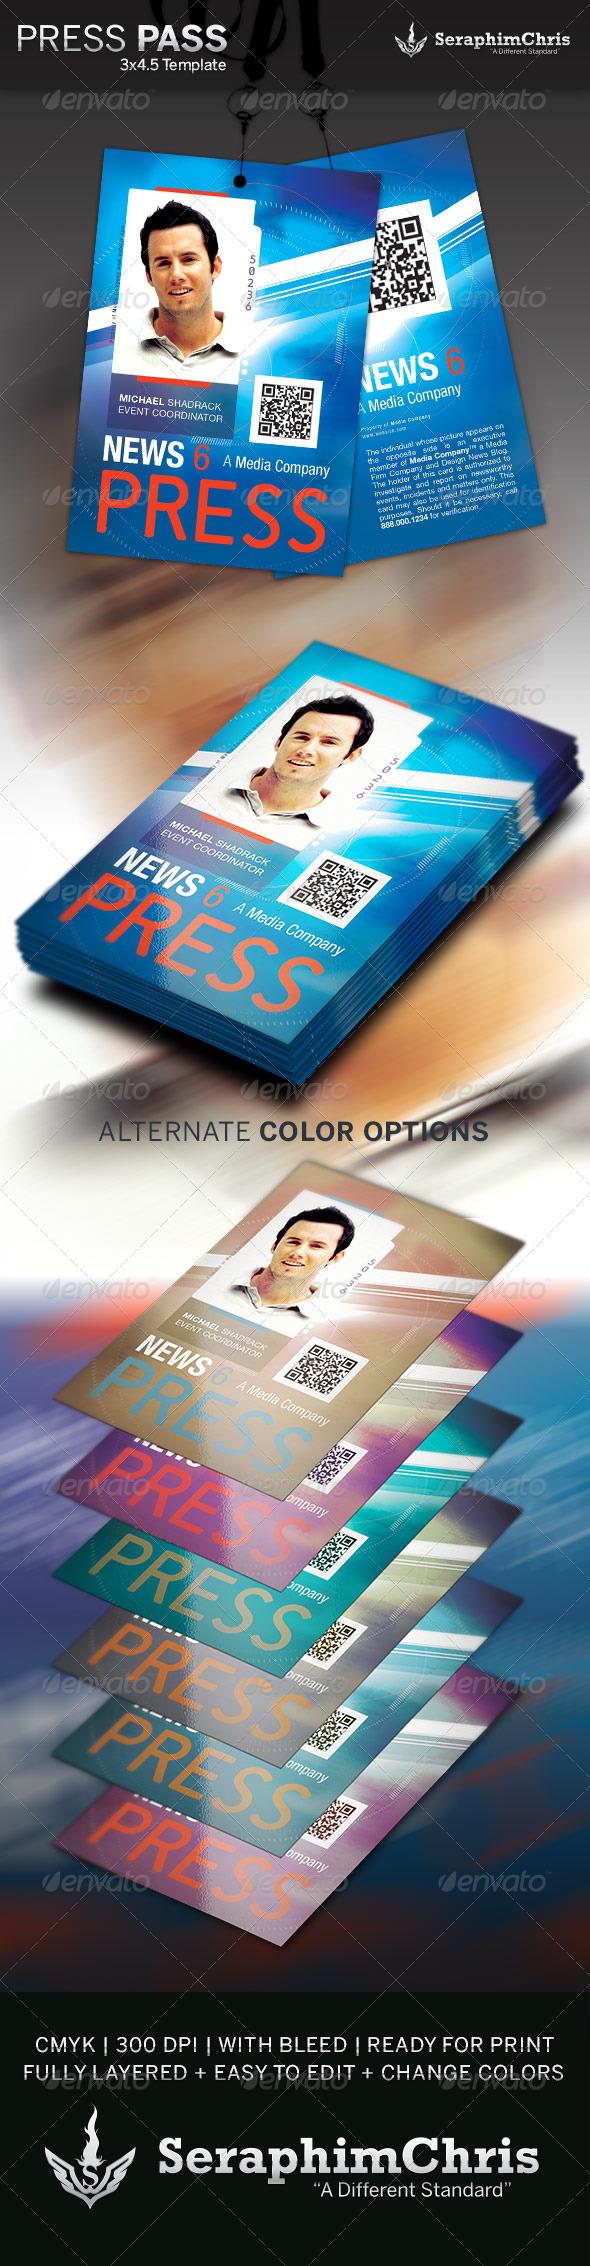 GraphicRiver Press Pass Template 3 4309537